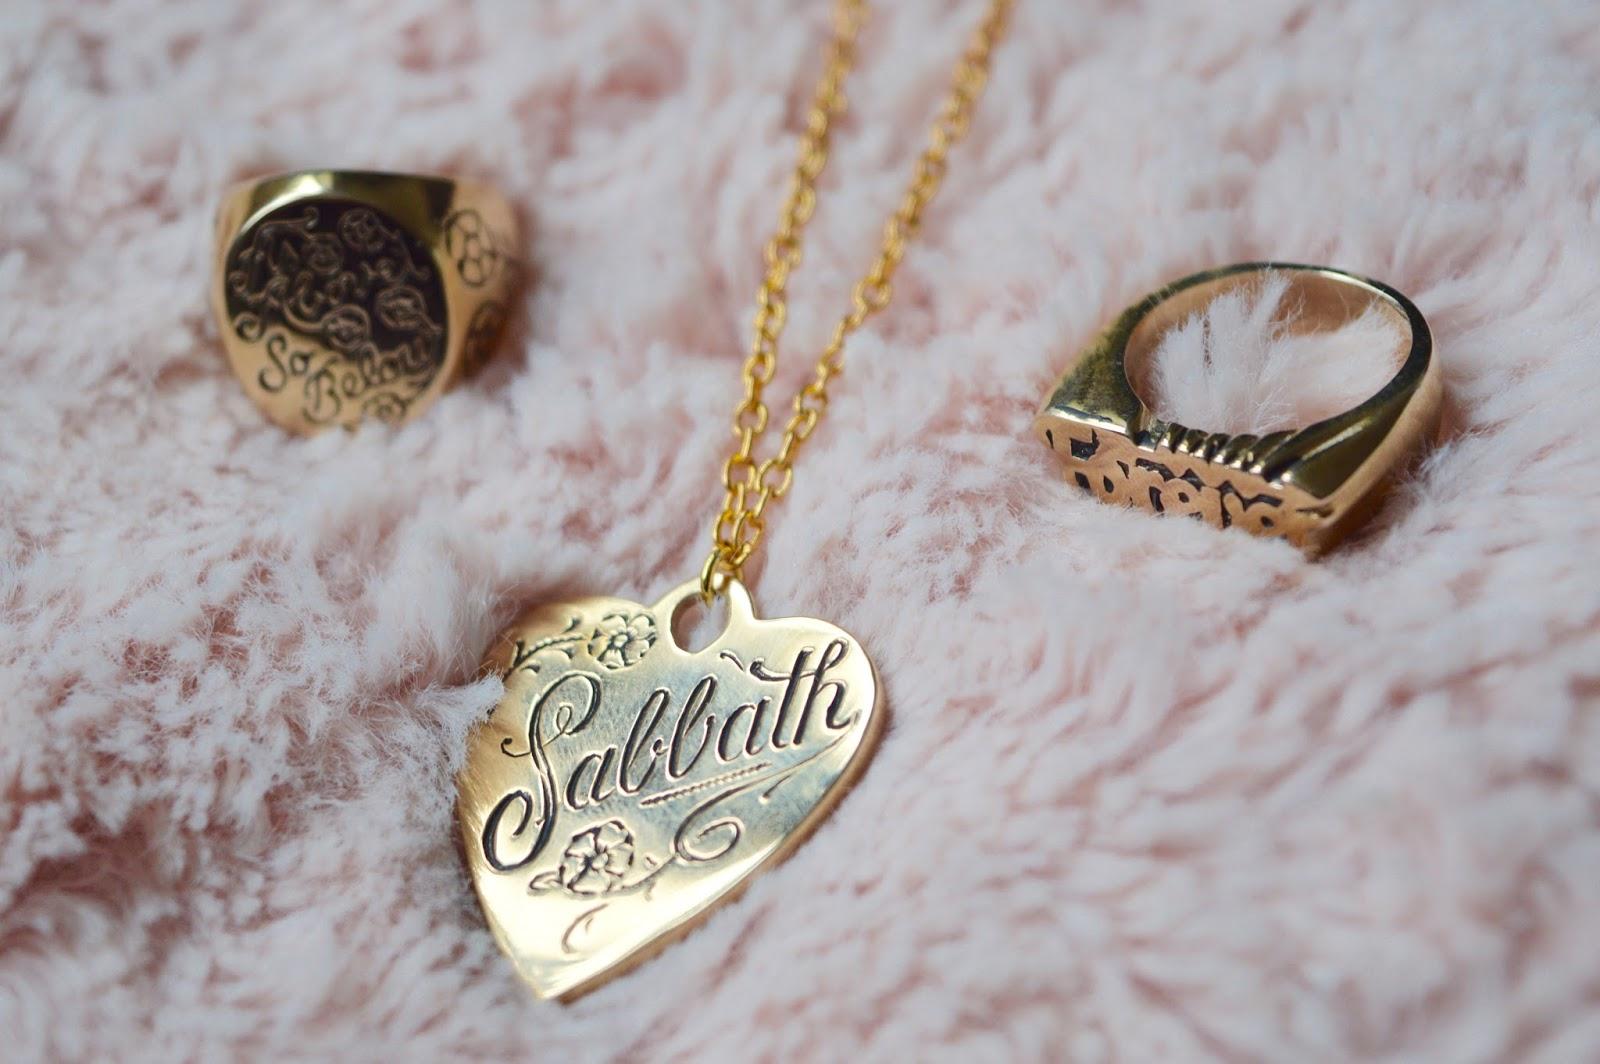 00a8f348c2d2 Jewellery Review  Souvenir Jewelry